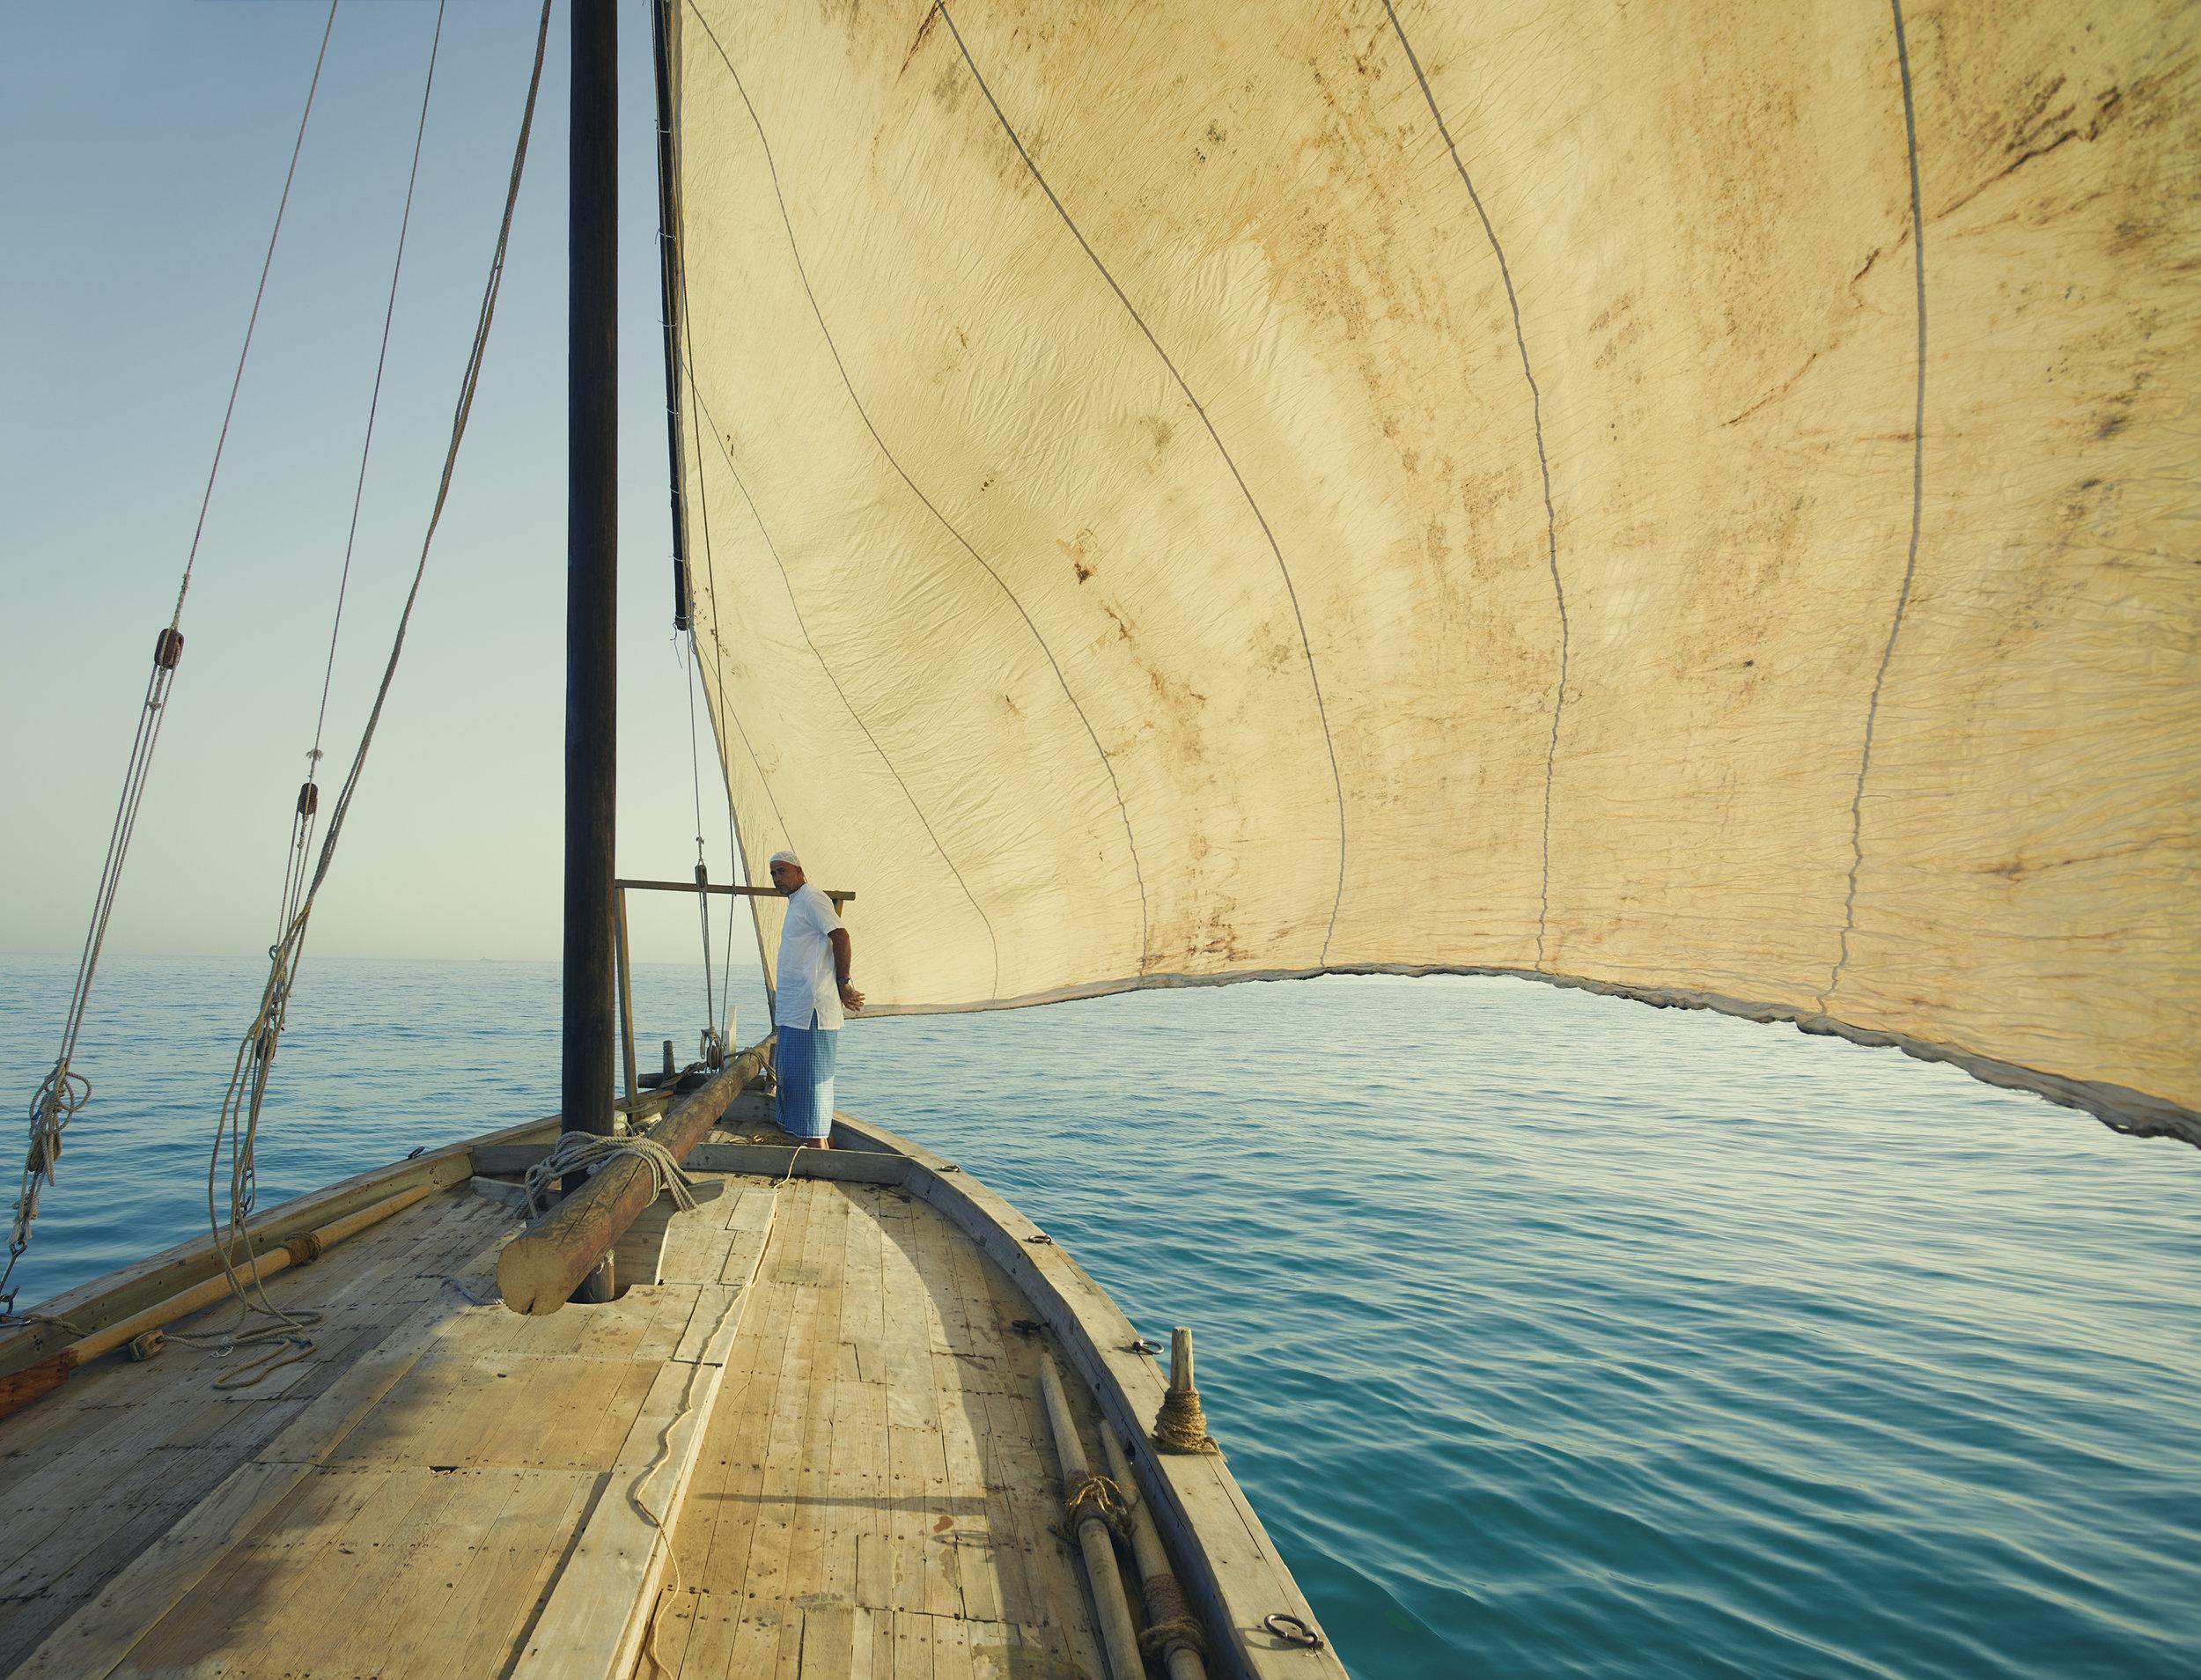 AbuDhabi_Day1_Boat_0626_FinalFlat.jpg